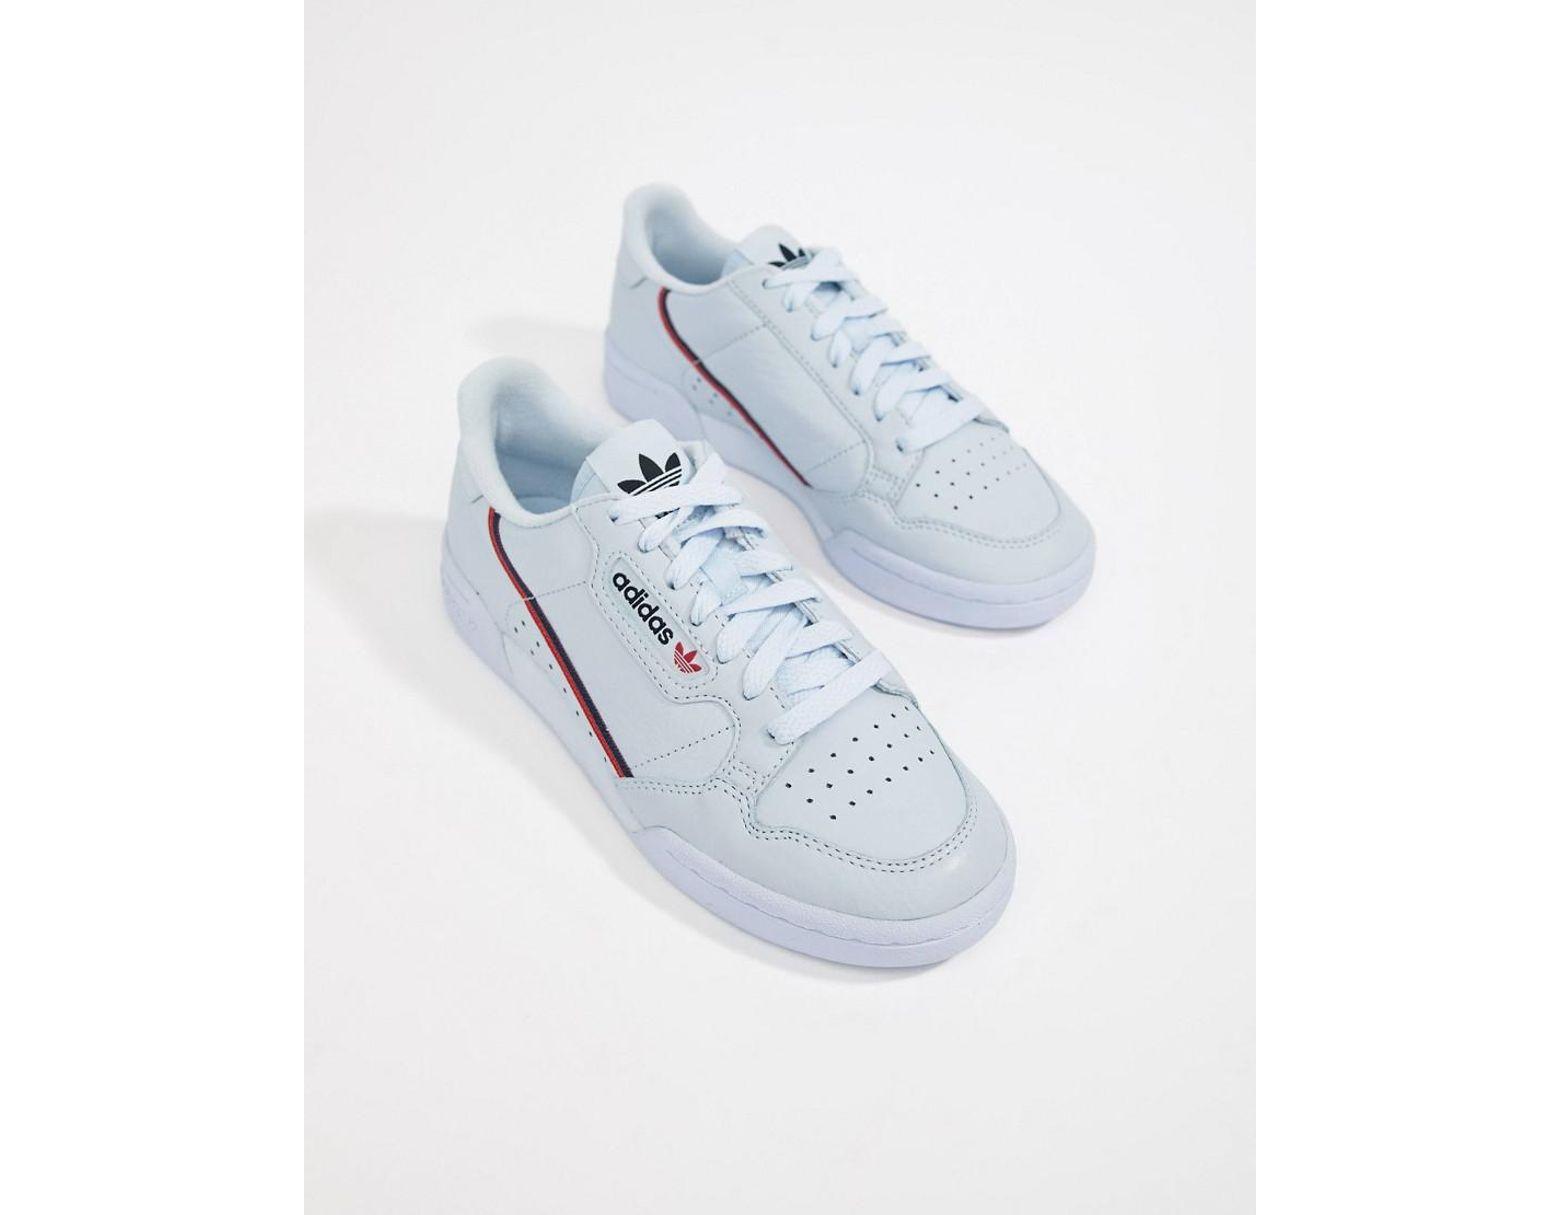 Adidas Clearance Sale Originals Gazelle OG shoes Bliss